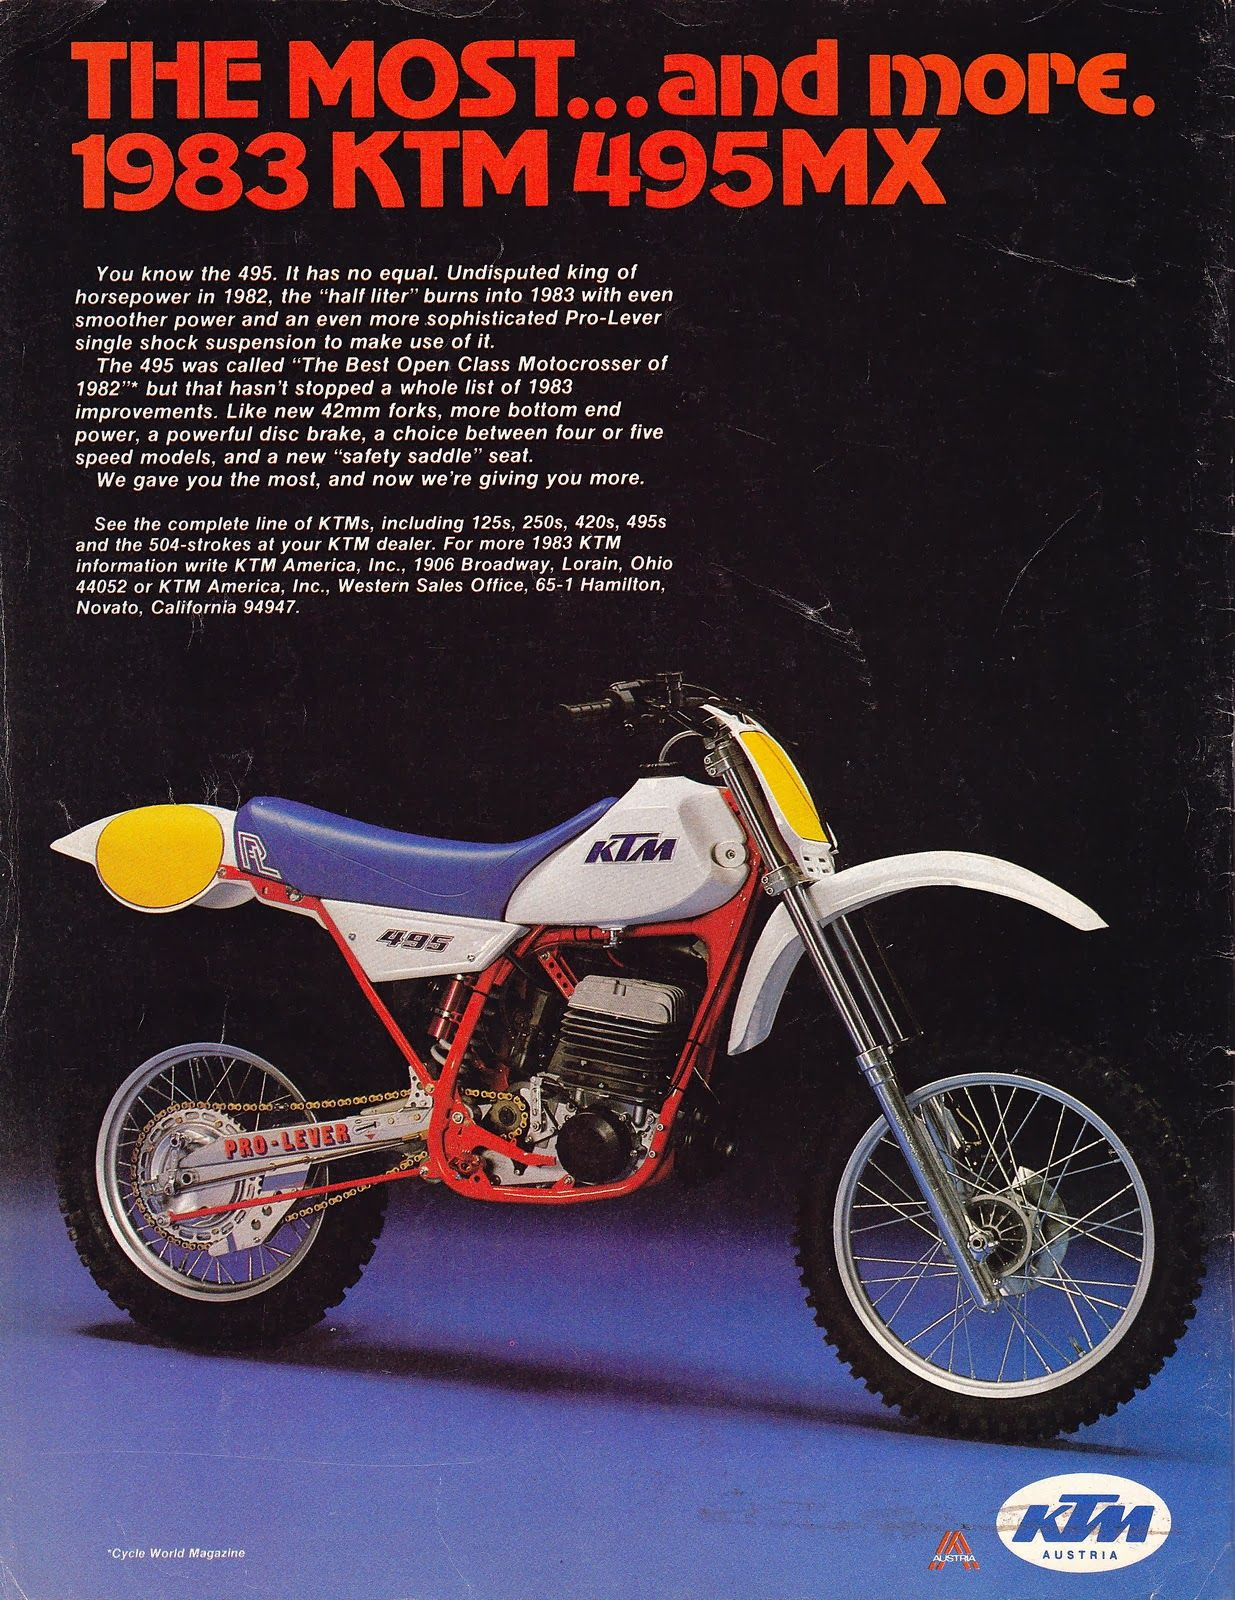 Ktm Mx 495 1983 Usa Jpg 1235 1600 Ktm Vintage Motocross Old School Motorcycles